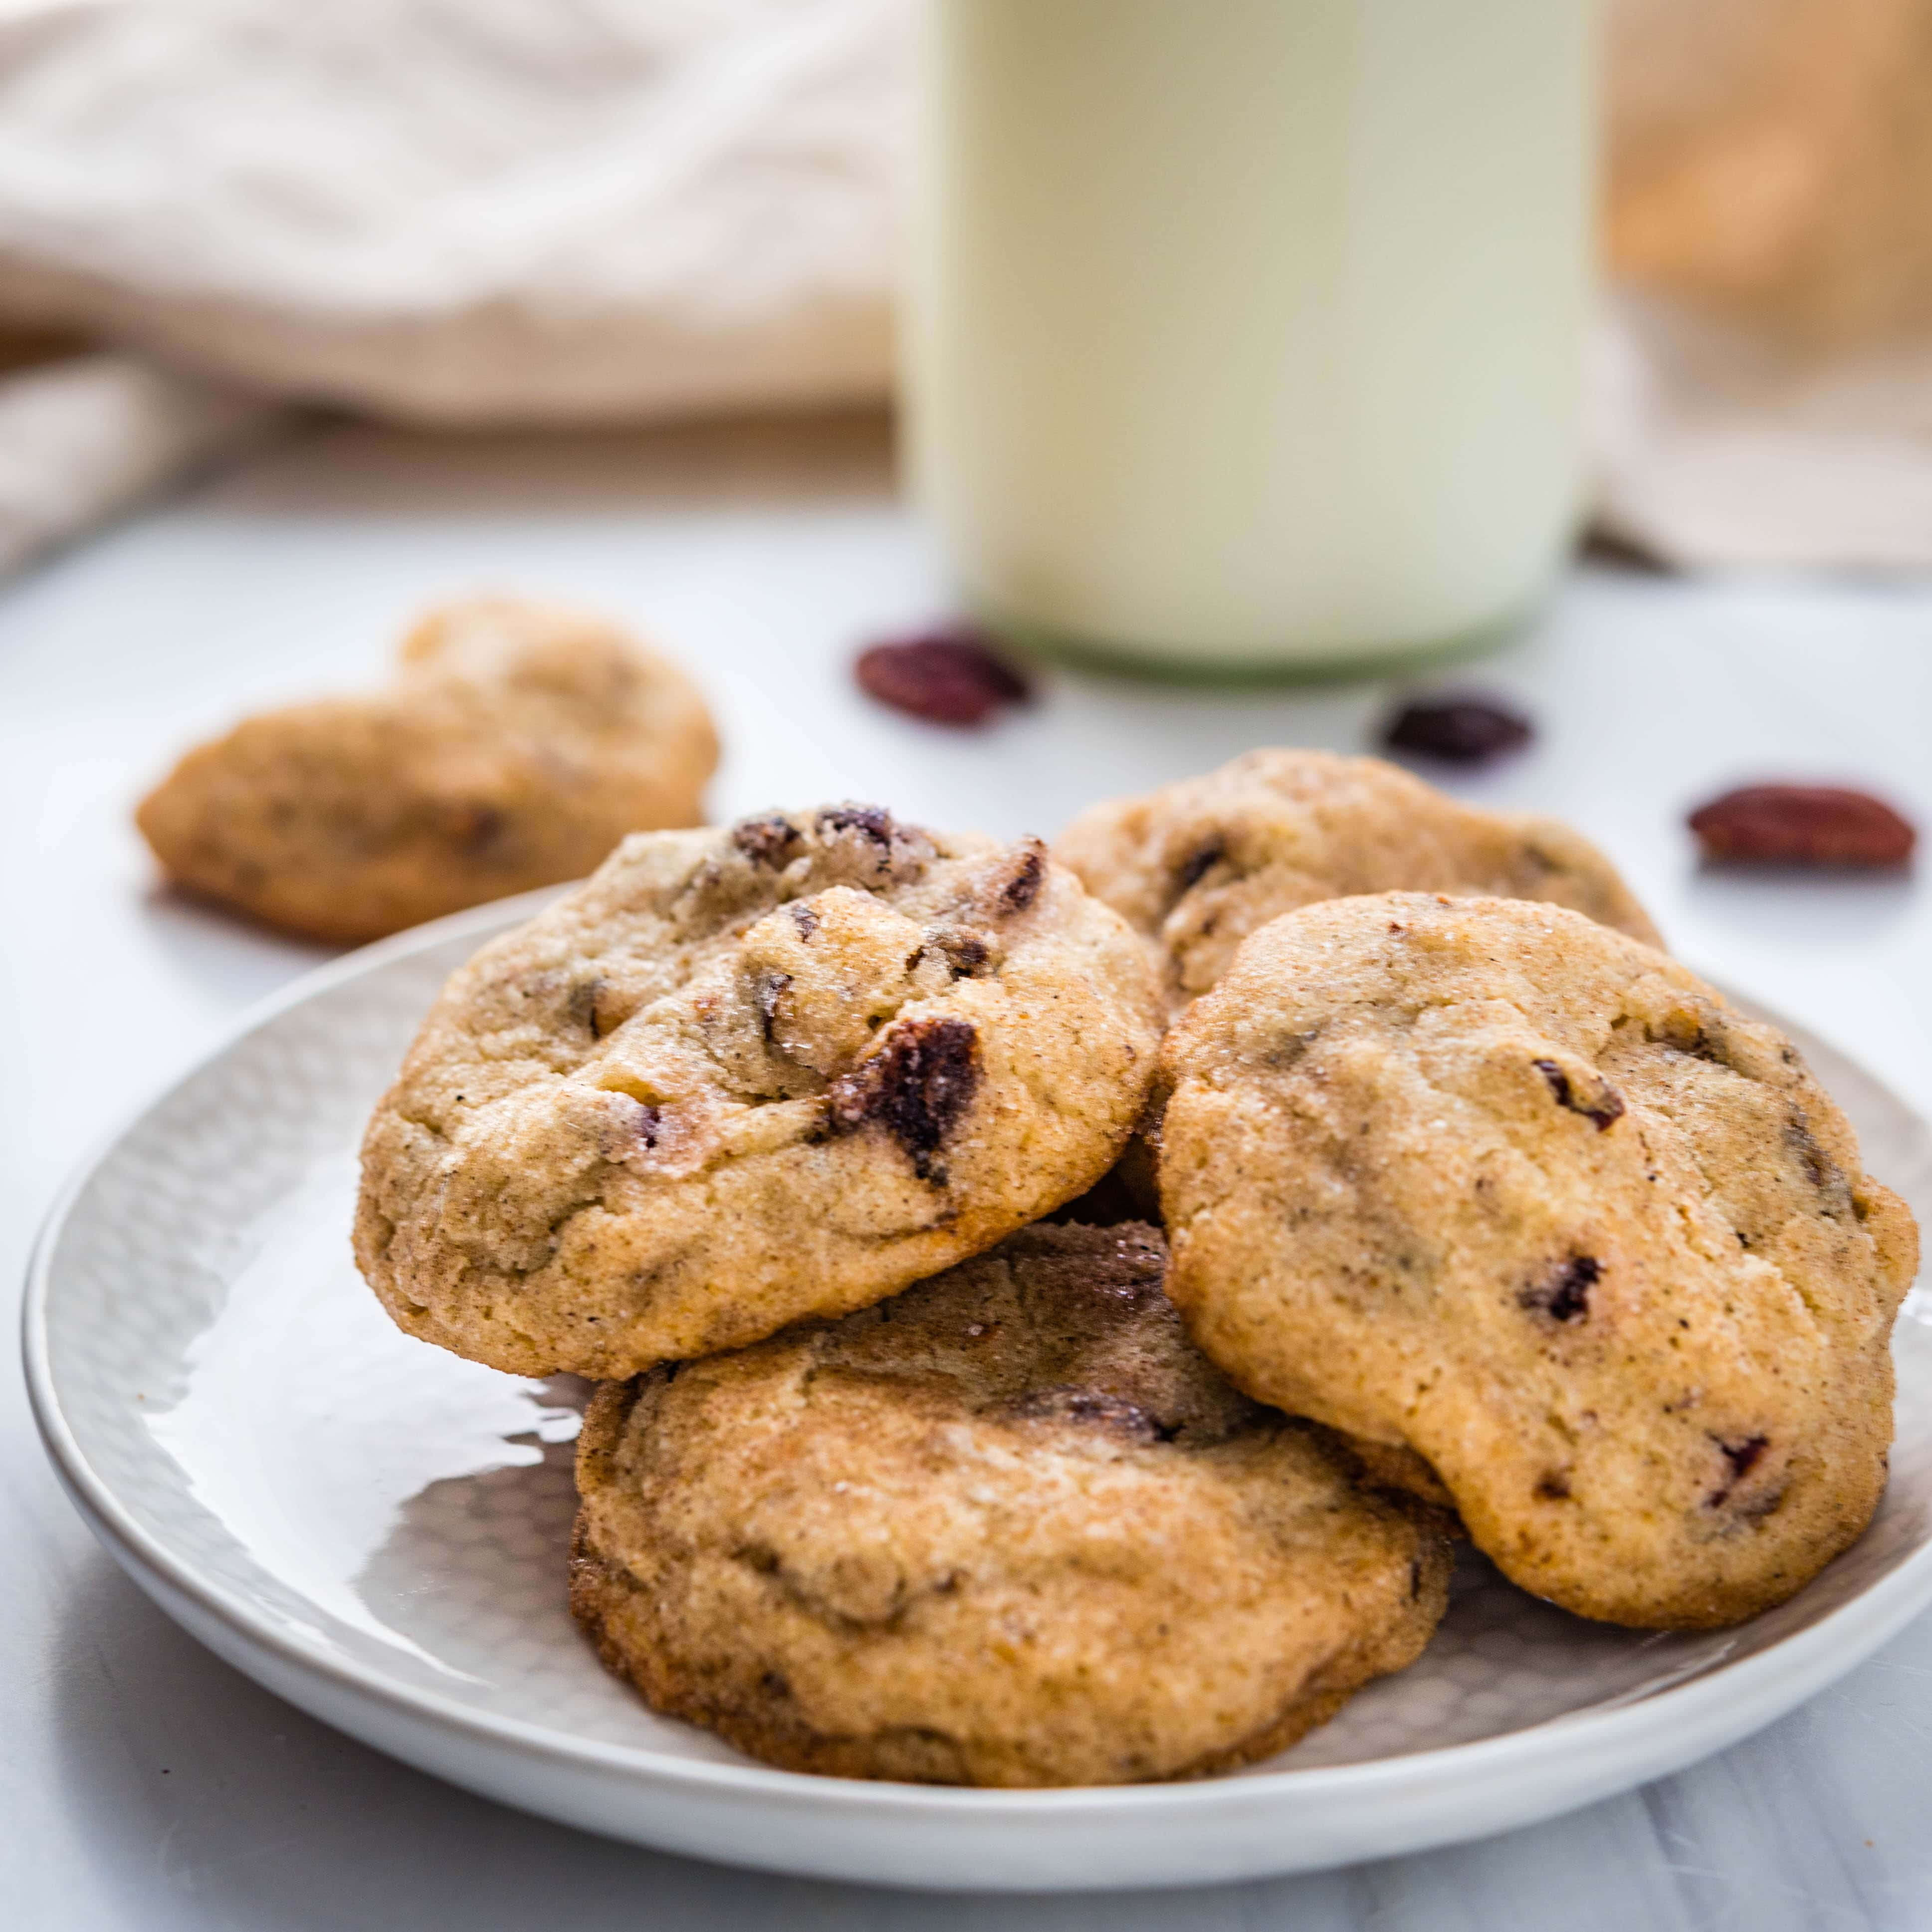 Cherry Pecan Cardamom Spice Cookies